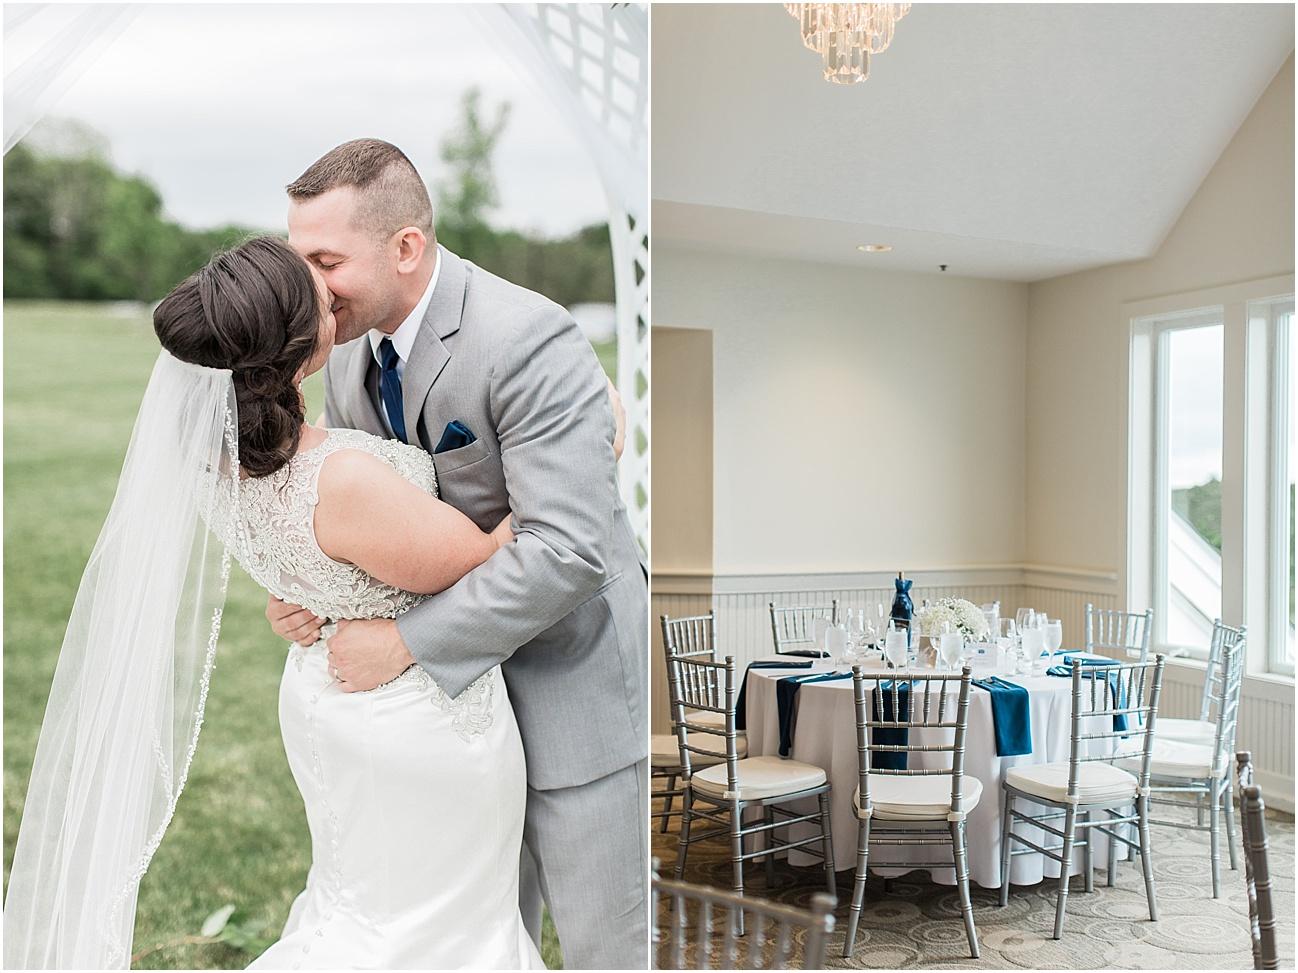 nicole_stephen_cape_club_nicky_falmouth_cod_boston_wedding_photographer_meredith_jane_photography_photo_0193.jpg